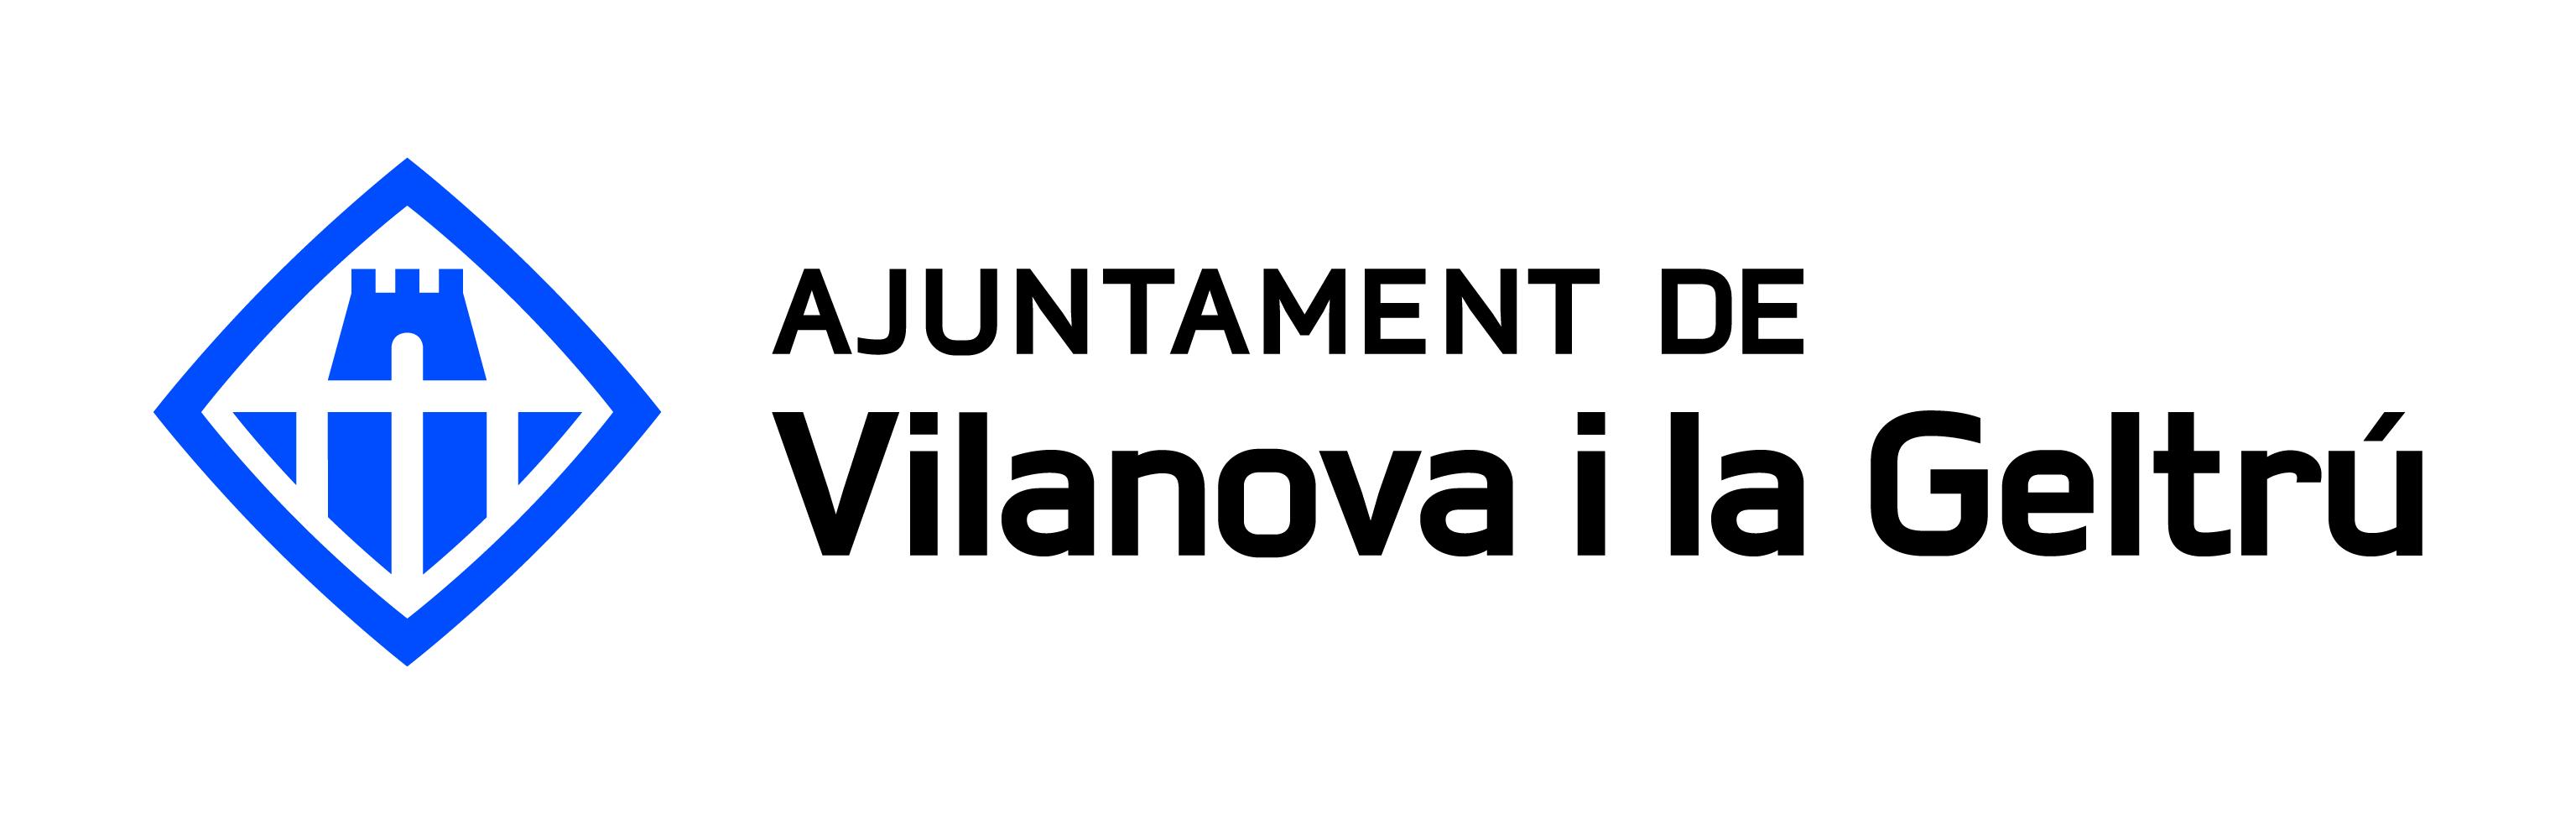 https://score-eu-project.eu/wp-content/uploads/2021/09/26.-versio_basica_cmyk.jpg